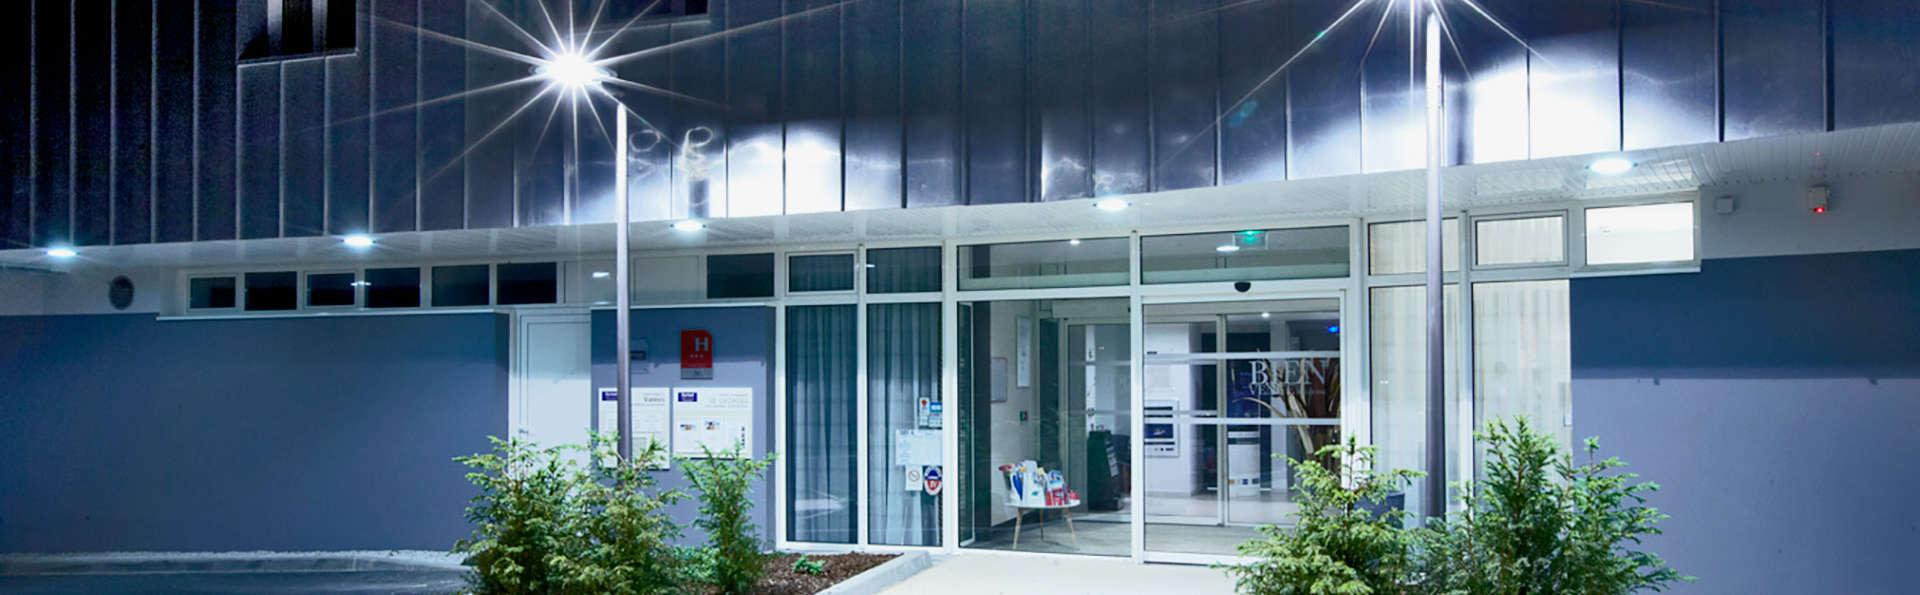 Kyriad Prestige Vannes centre palais des arts - EDIT_FRONT_01.jpg